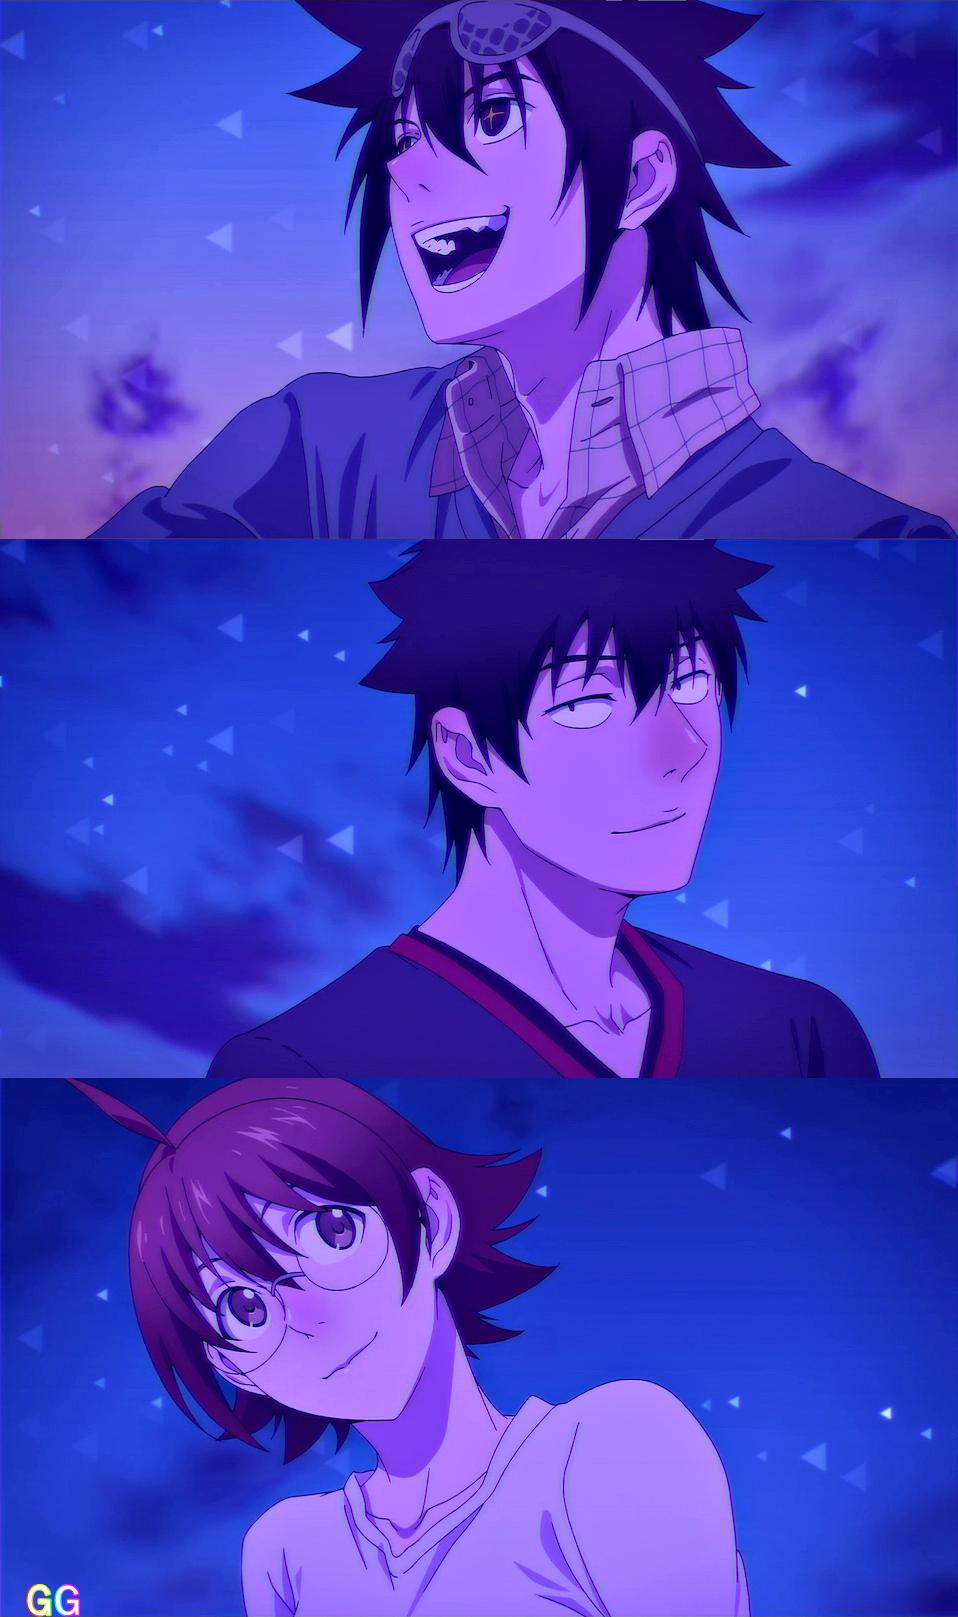 Gghimself Em 2020 Arte Anime Animes Wallpapers Anime